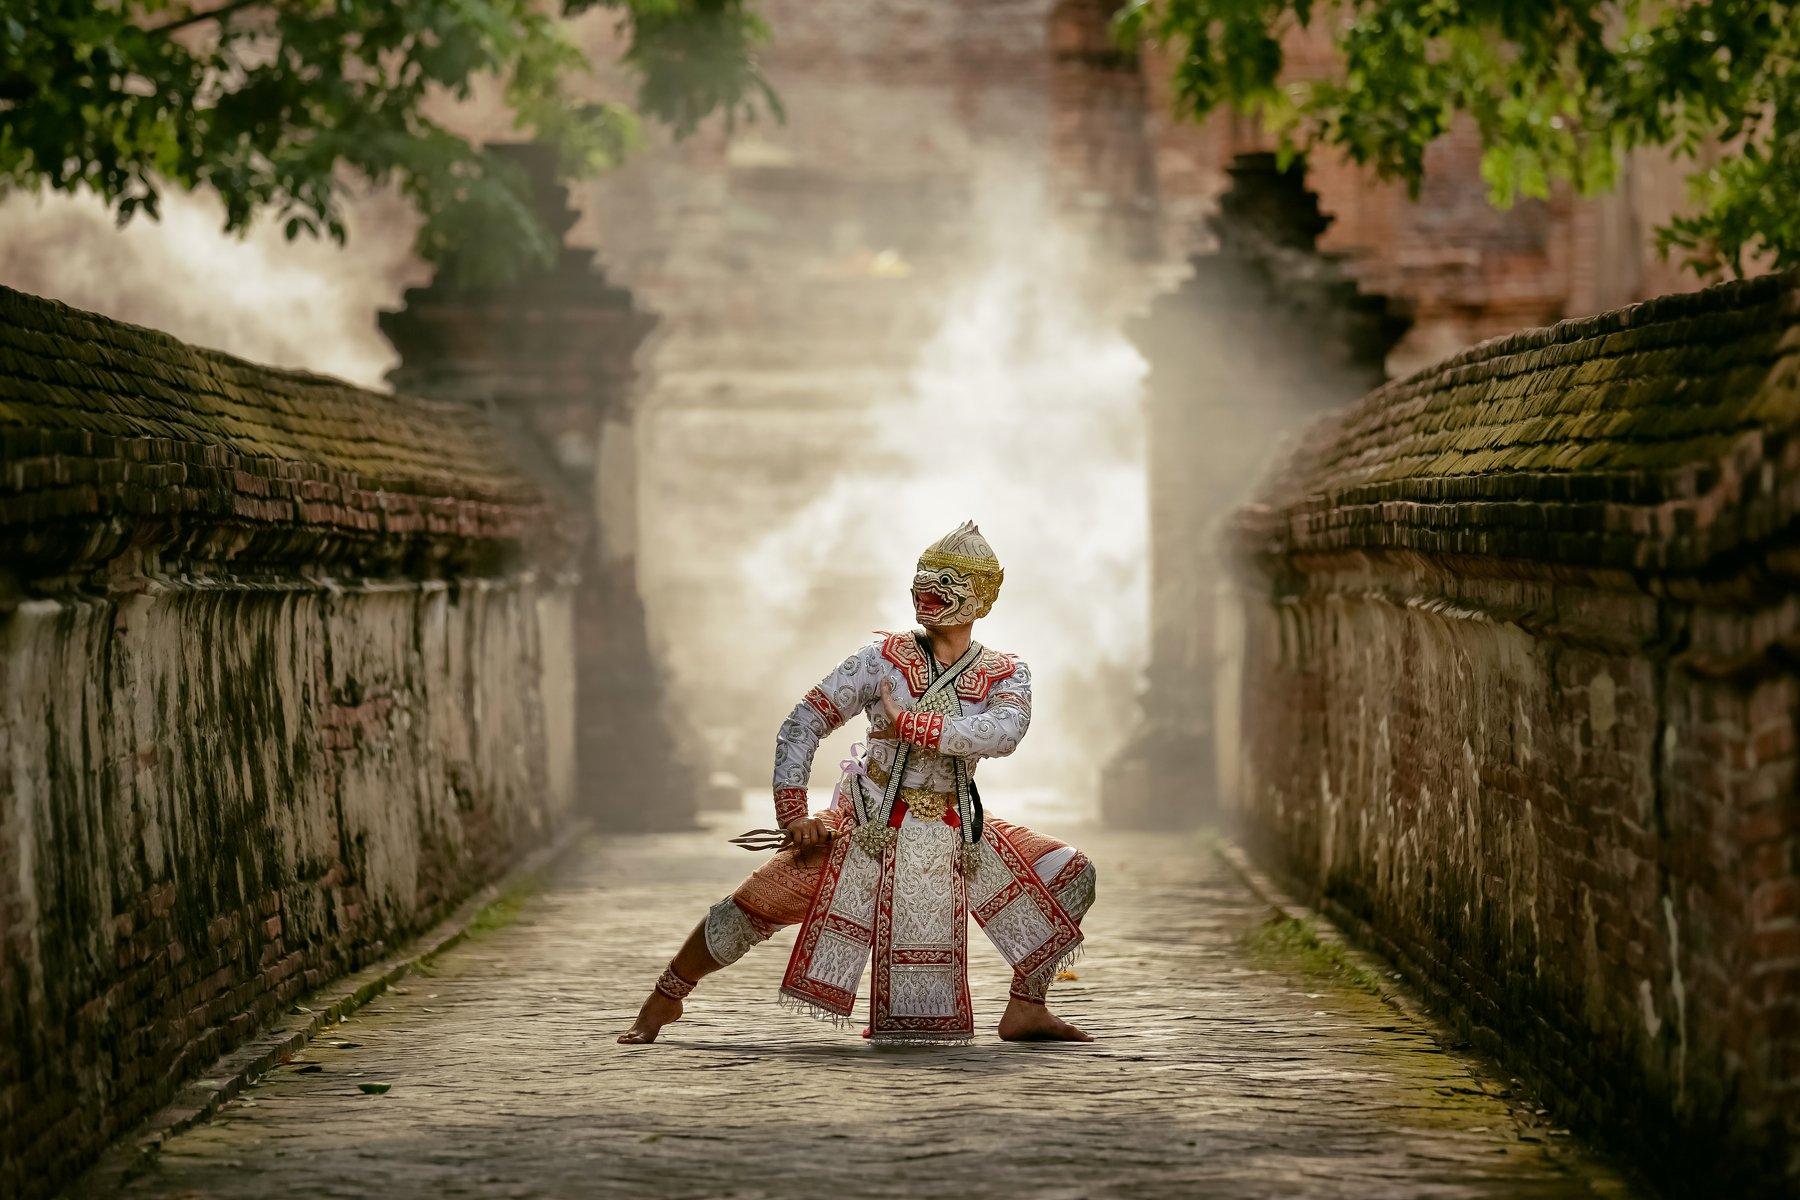 thailand,performance,ramayana,monkey,arts,asia,asian, ADIREK M